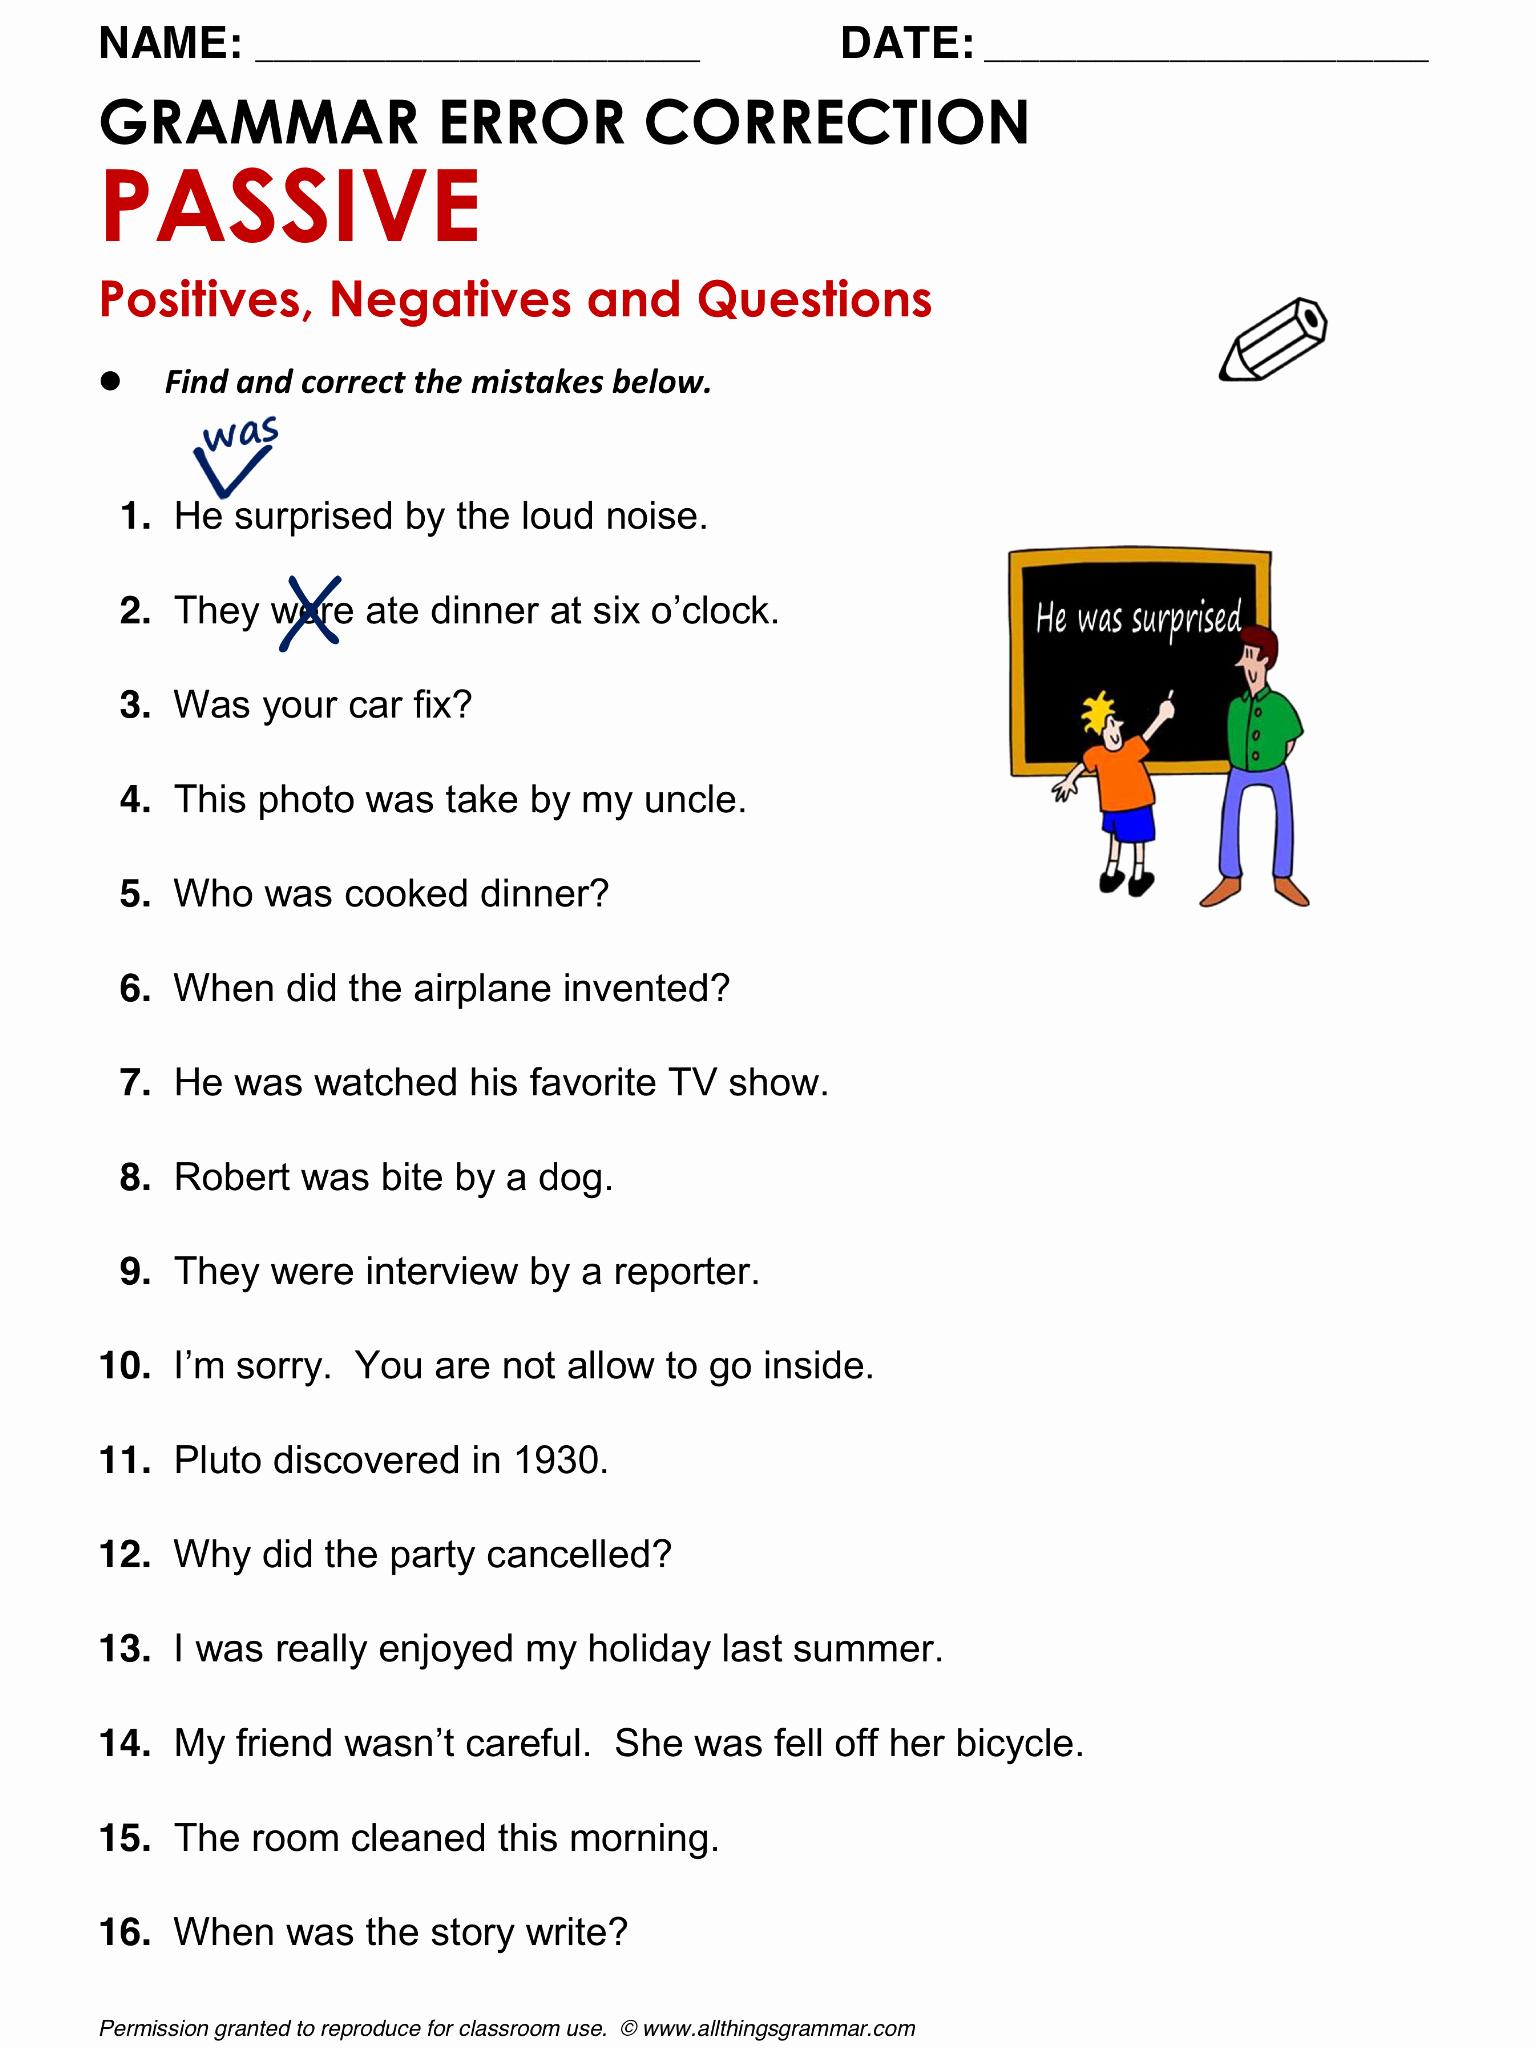 Grammatical Error Worksheets Elegant English Grammar Grammar Error Correction Passive